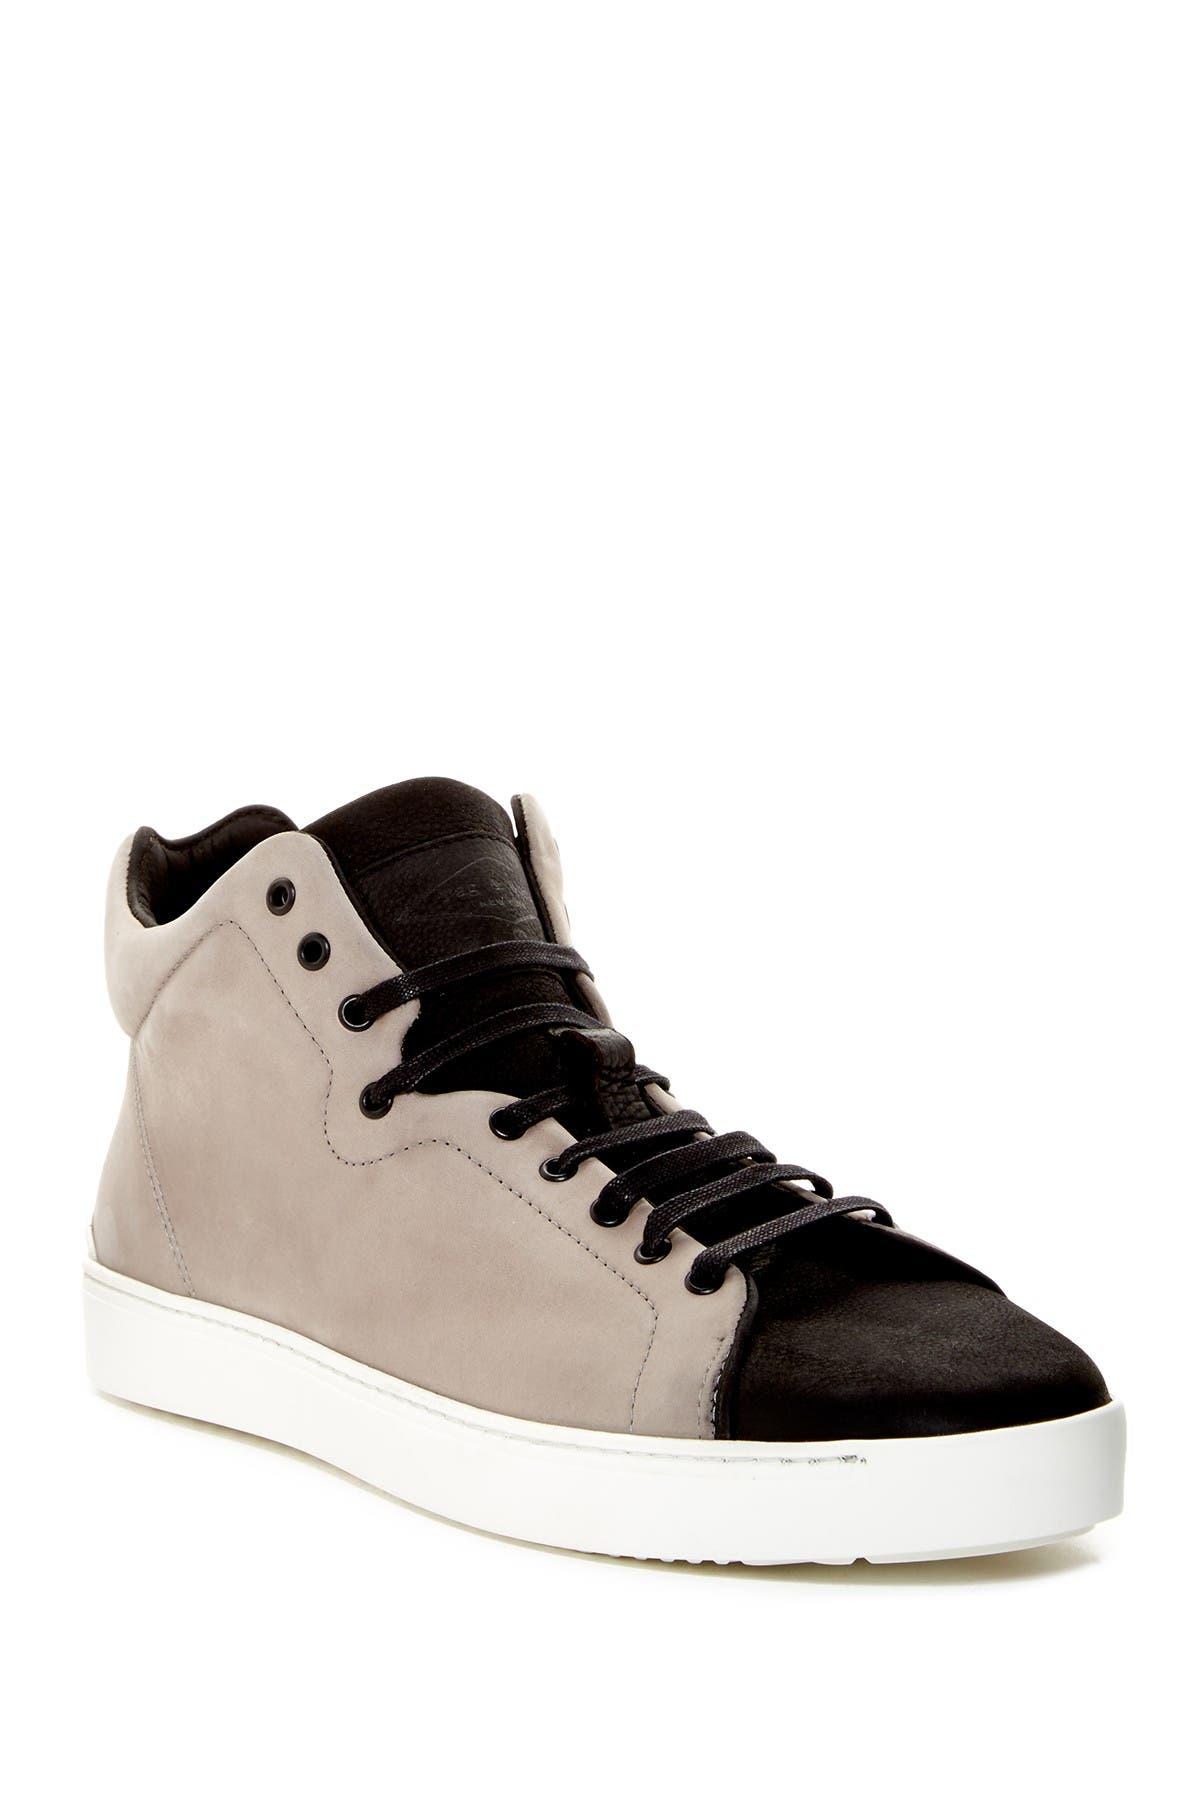 Image of Rag & Bone Kent High-Top Sneaker